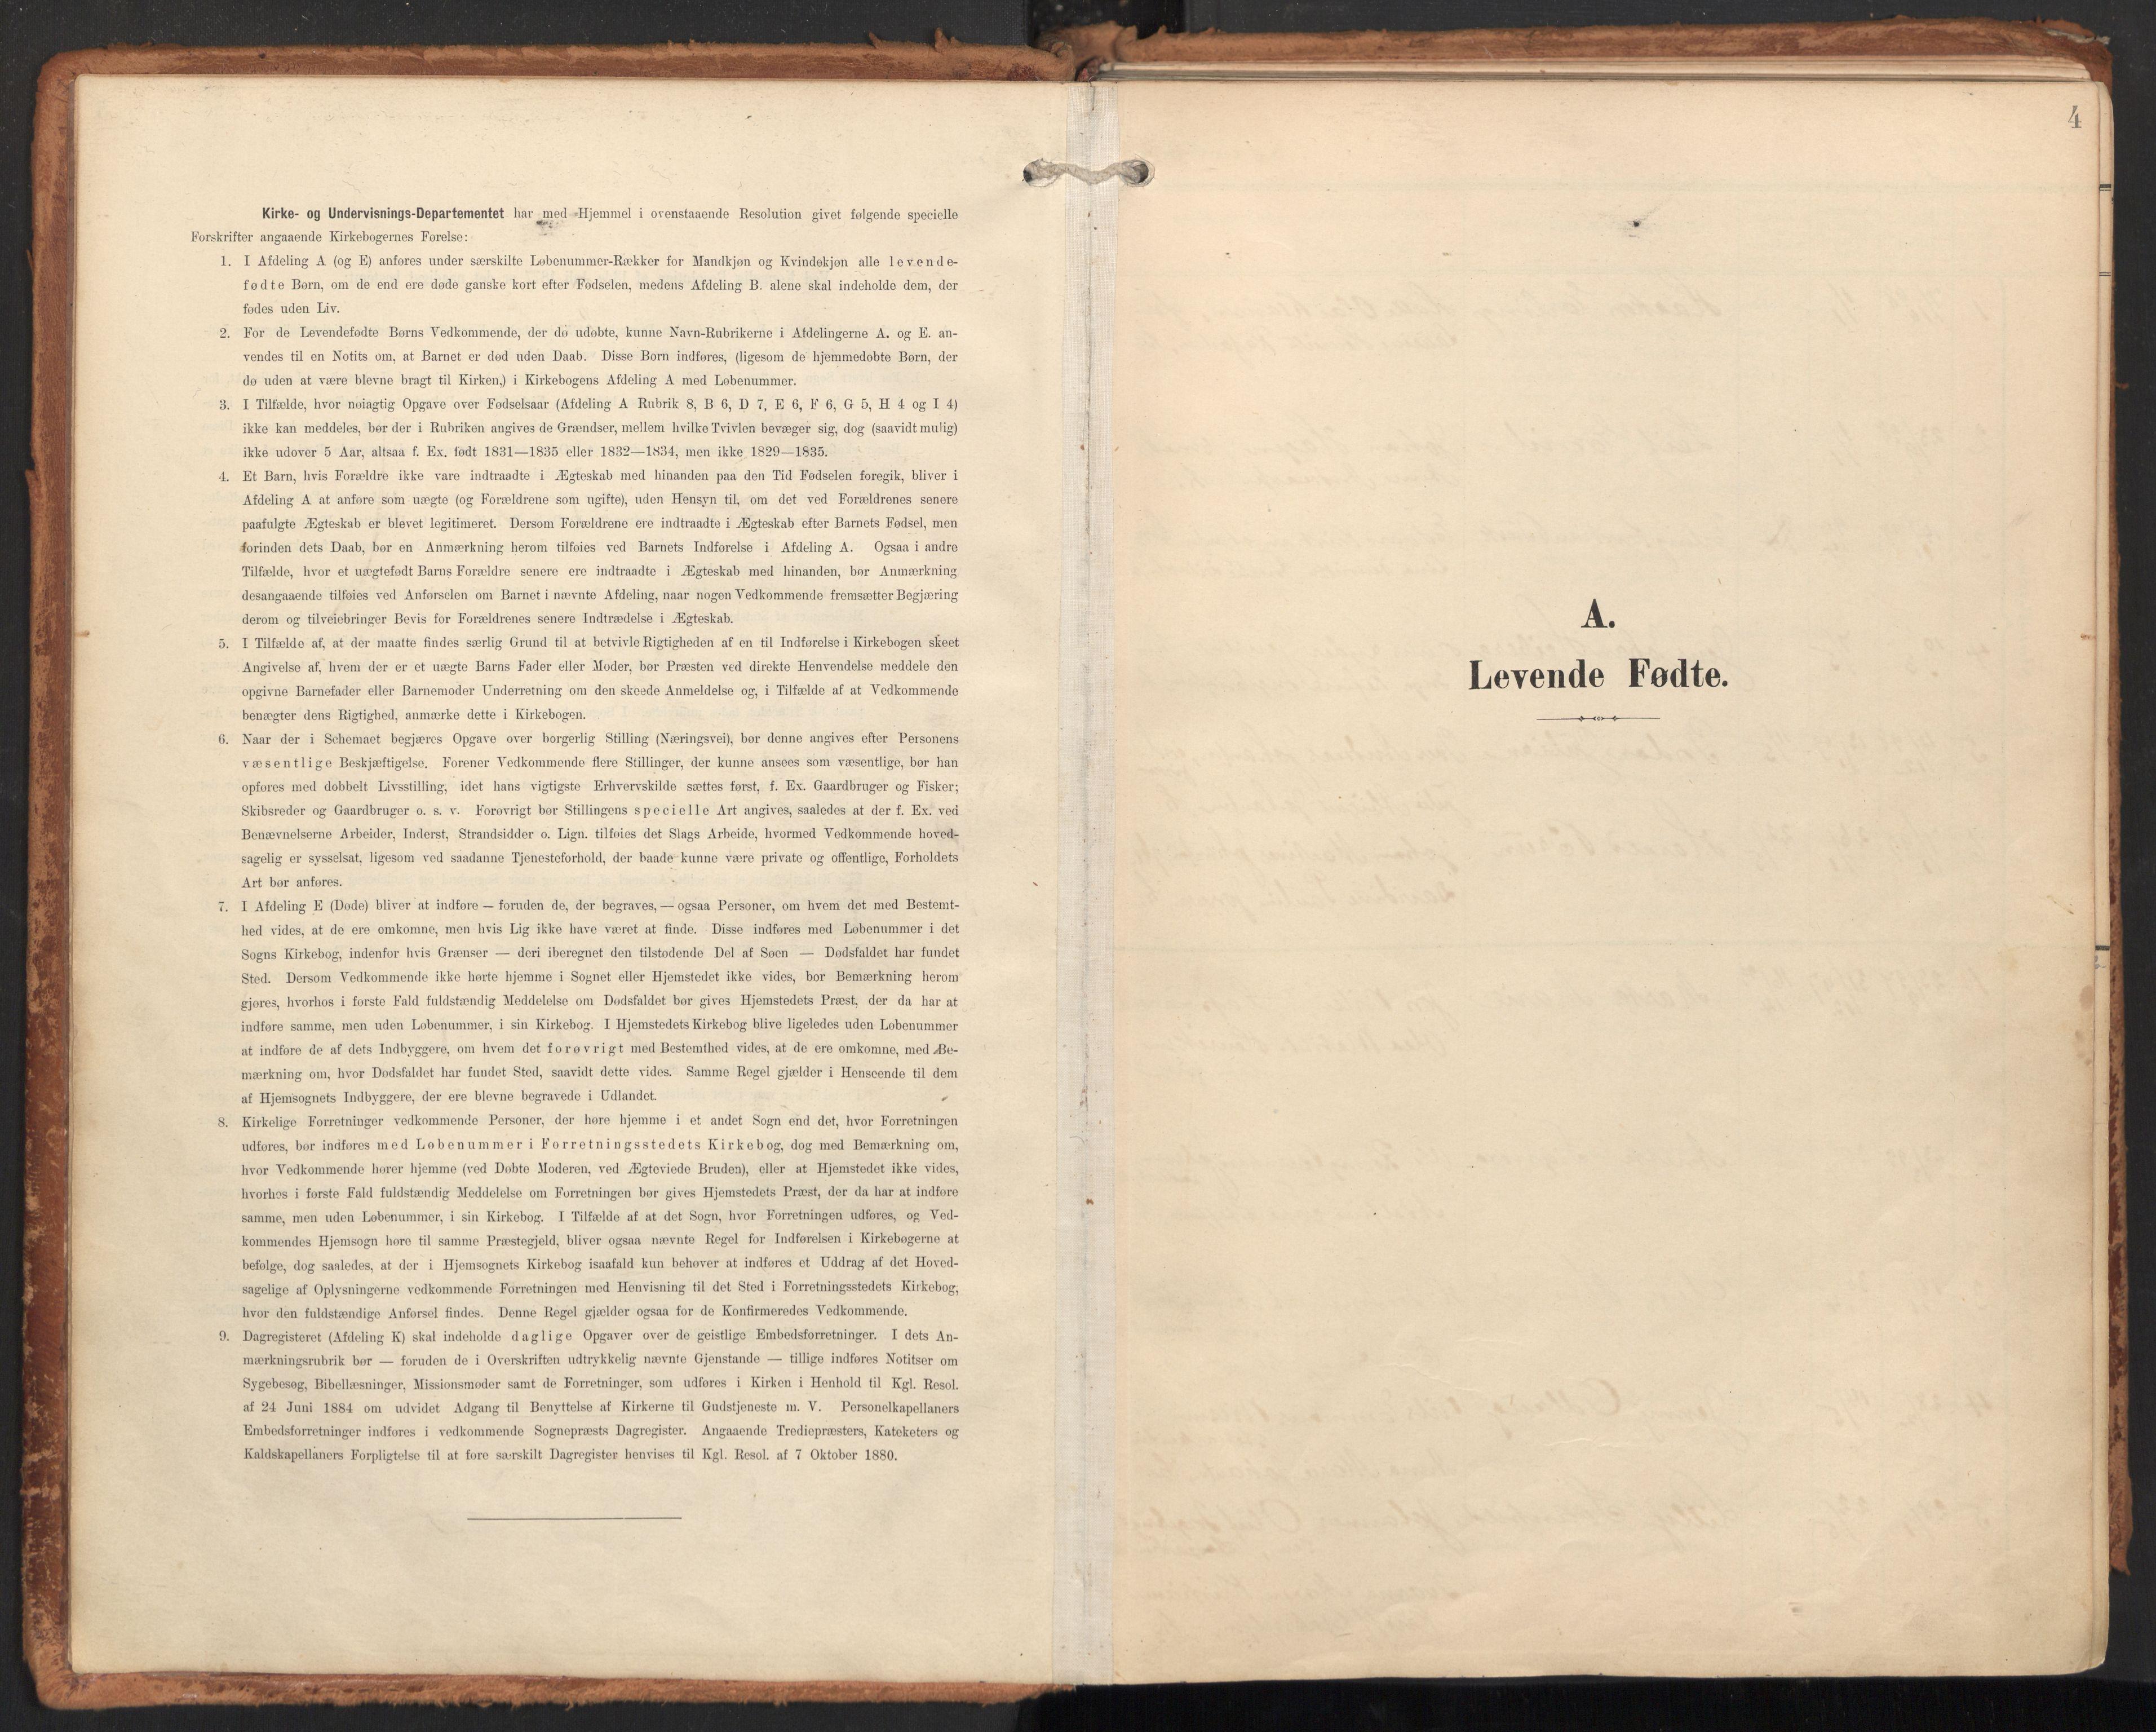 SAT, Ministerialprotokoller, klokkerbøker og fødselsregistre - Nordland, 814/L0227: Ministerialbok nr. 814A08, 1899-1920, s. 4